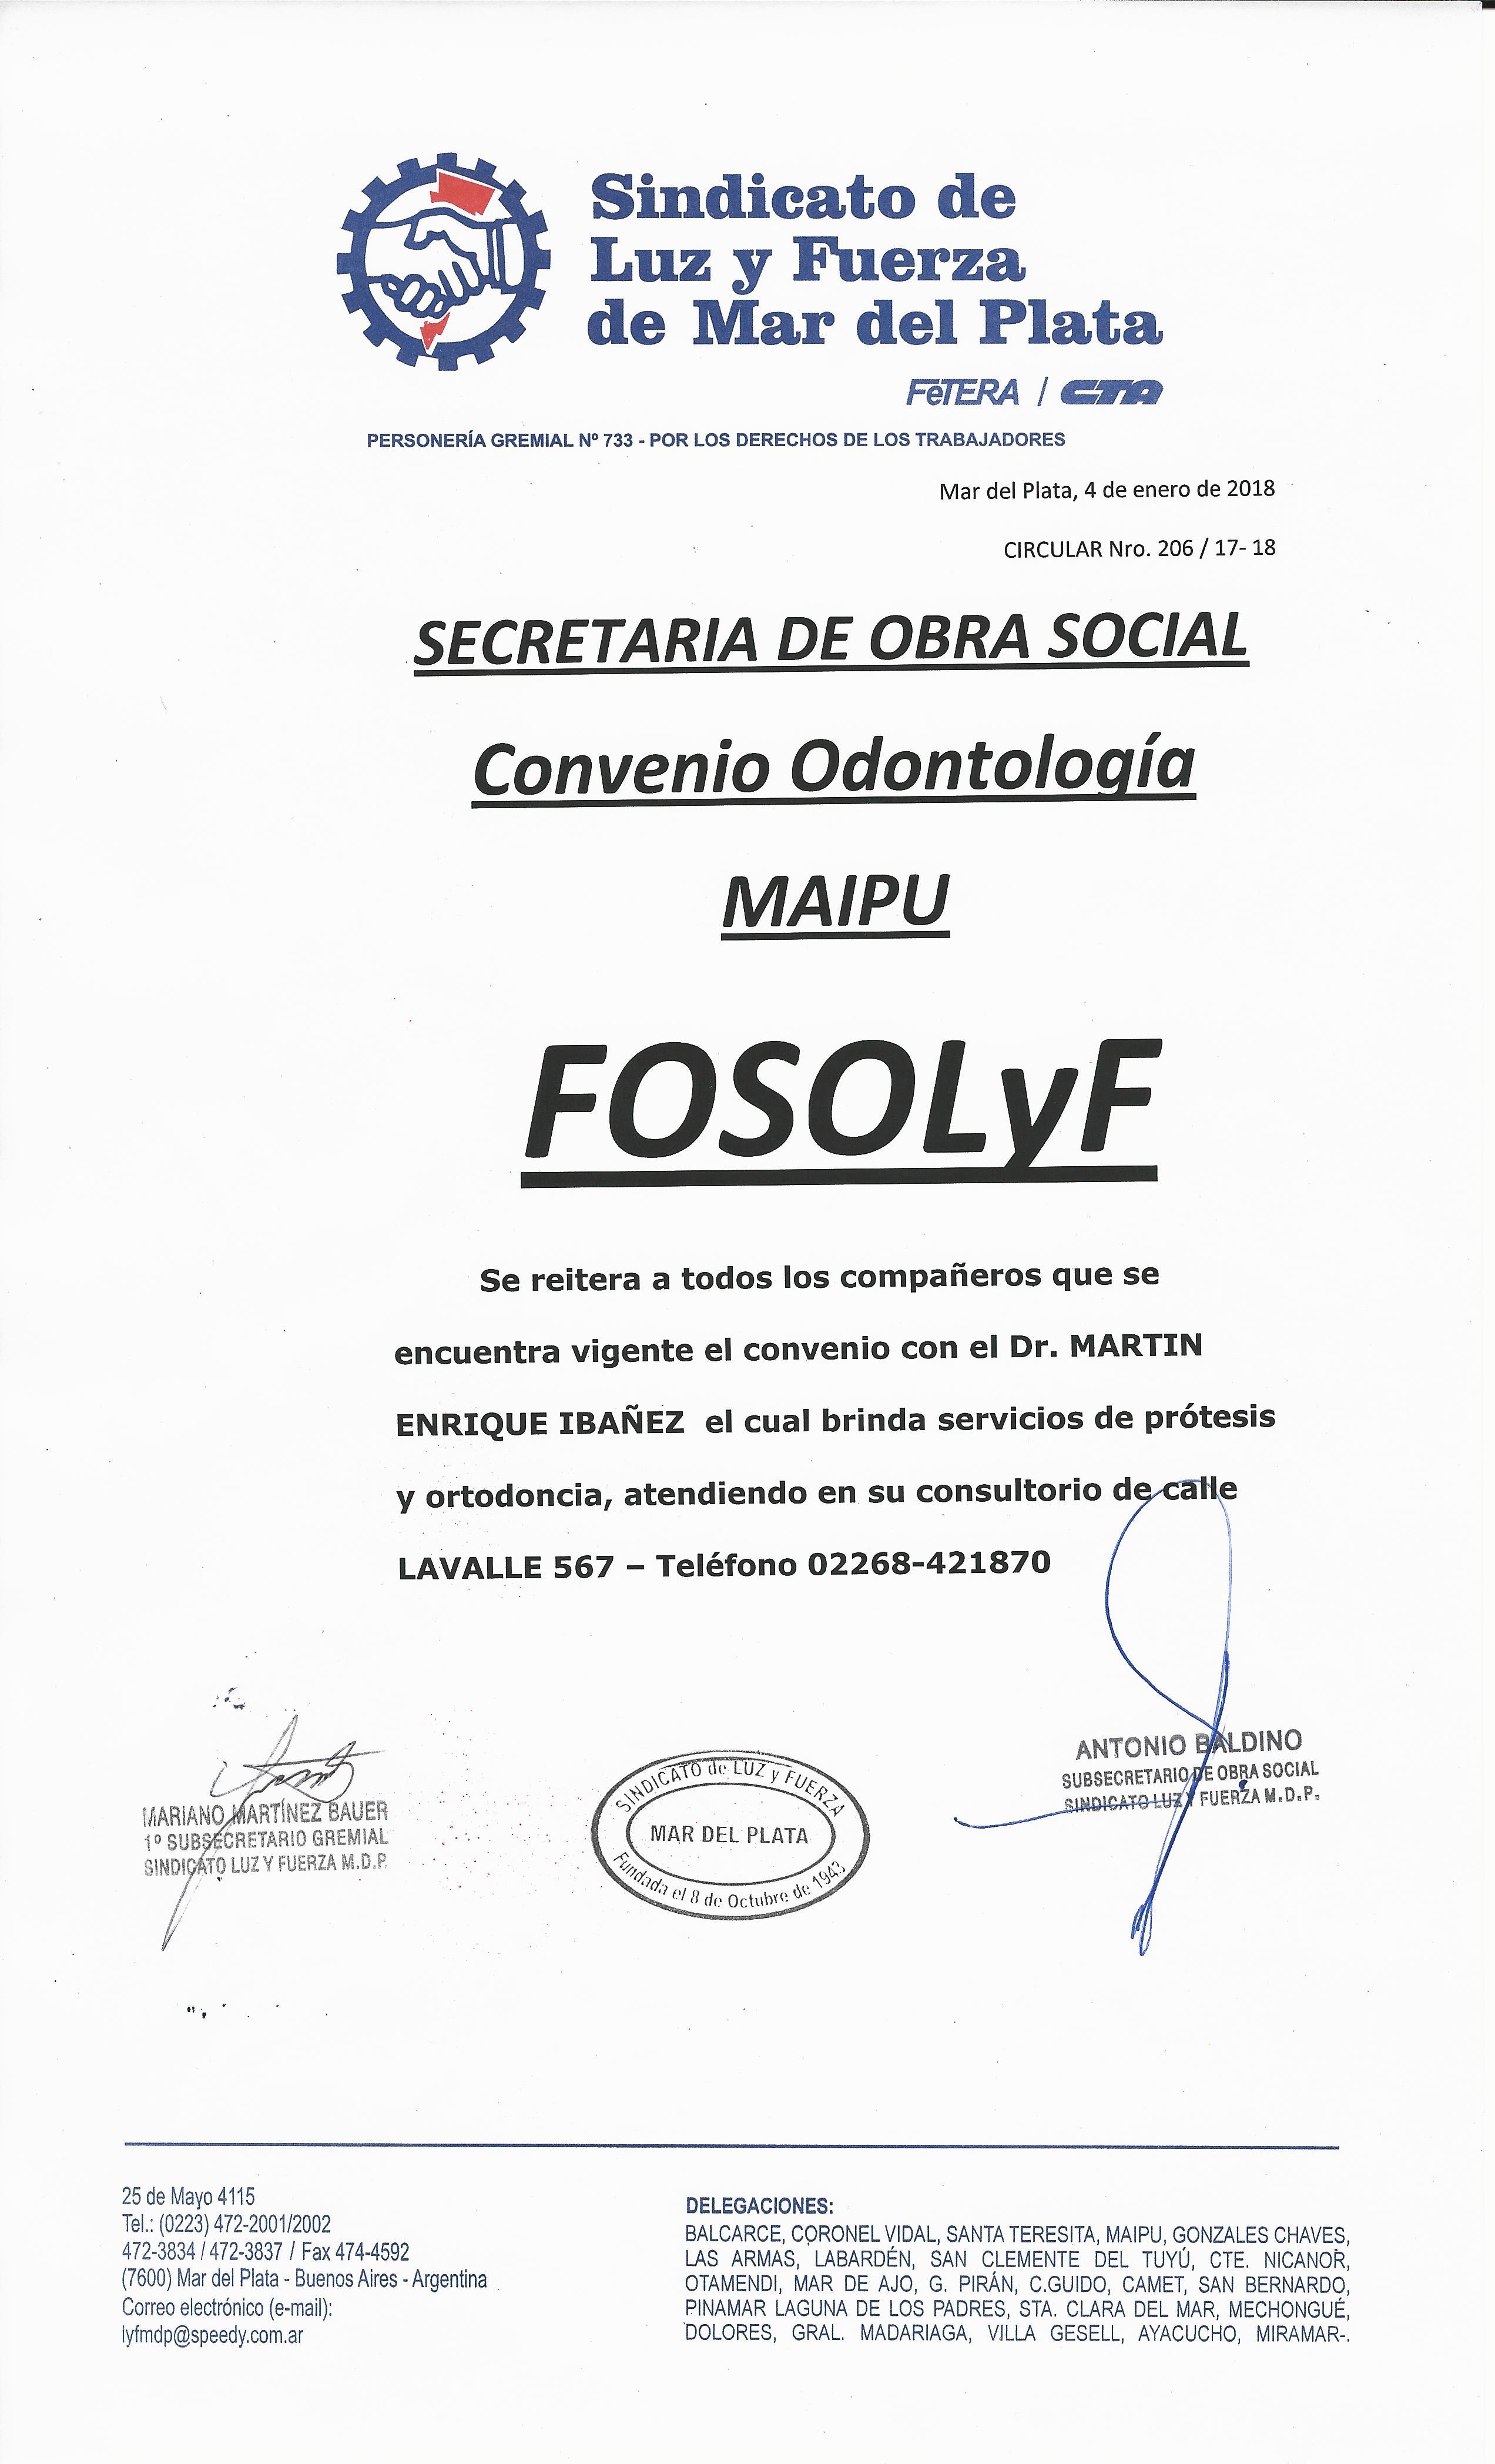 OBRA SOCIAL: CONVENIO ODONTOLÓGICO EN MAIPÚ